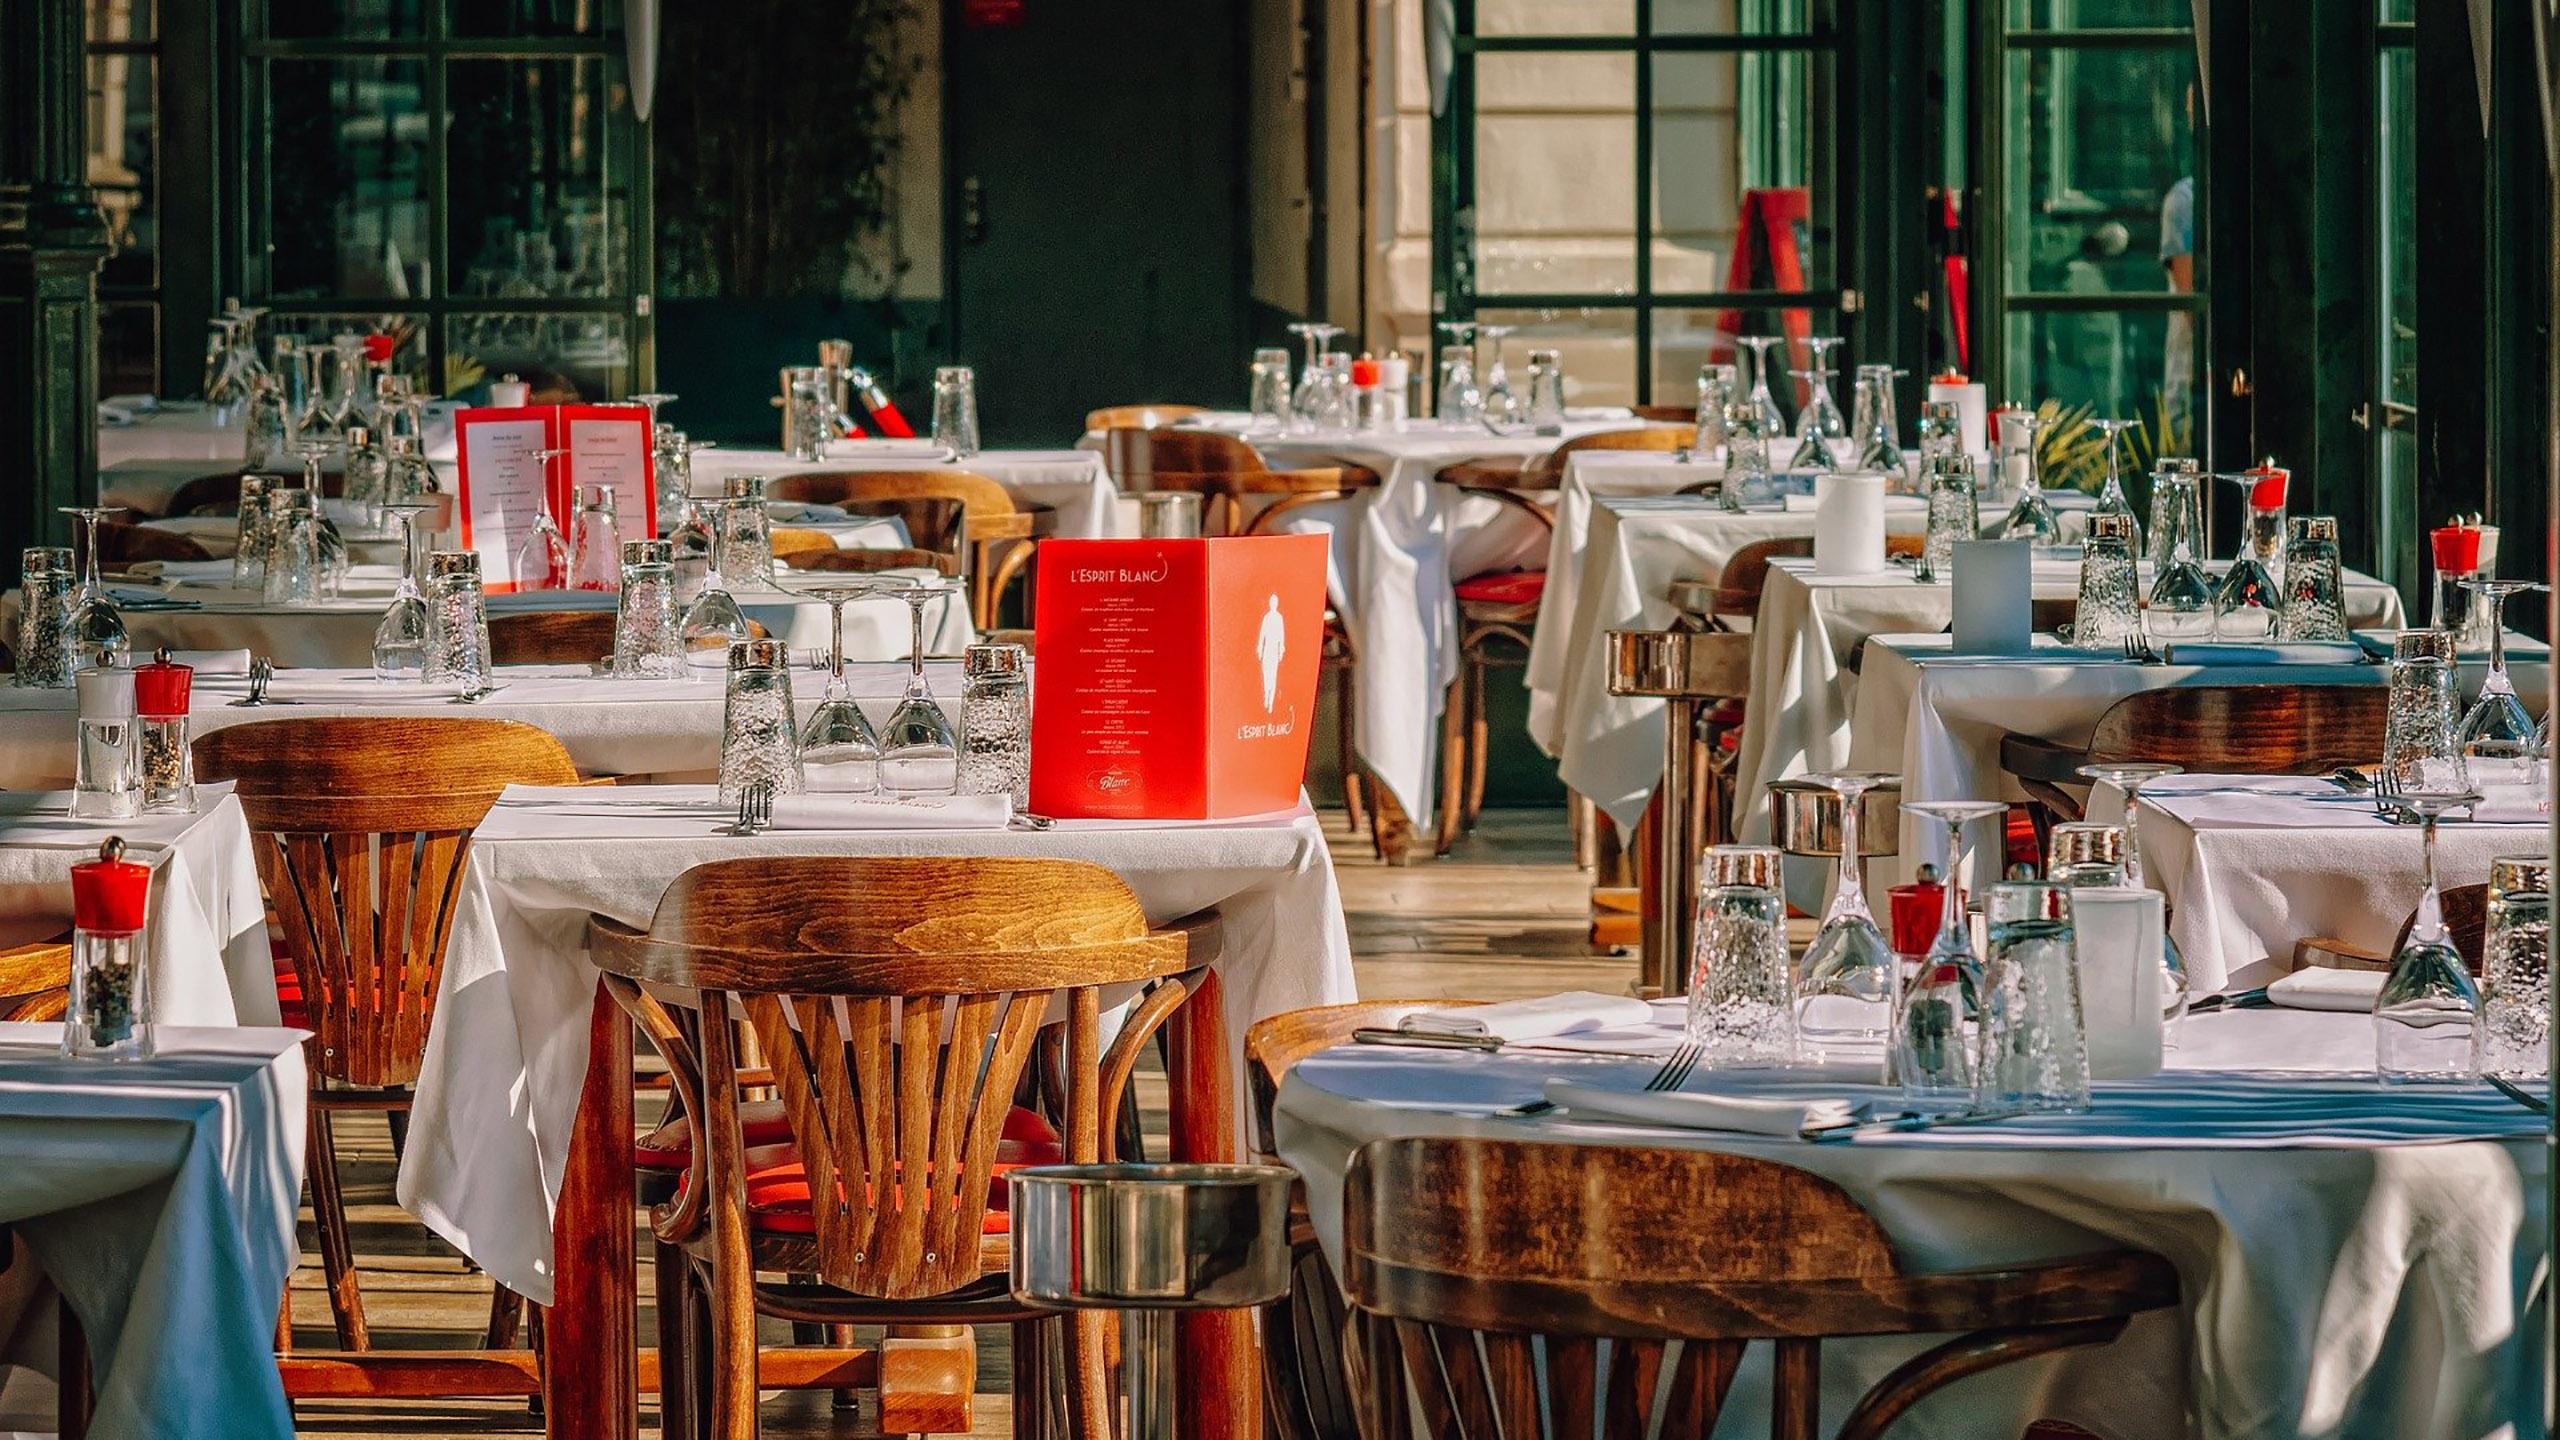 servicio a domicilio, restaurantes, covid19